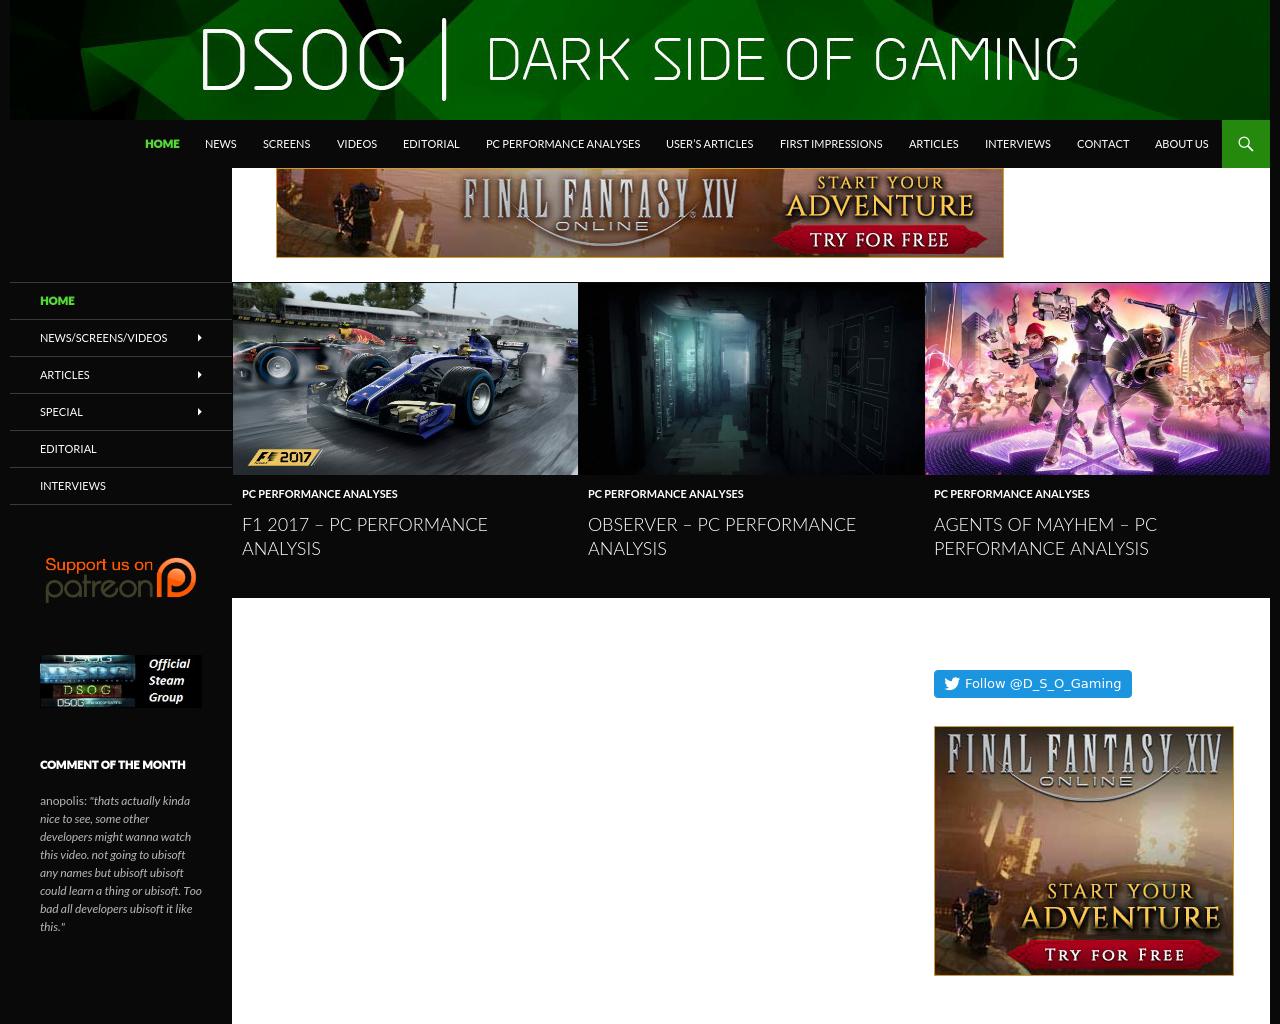 DSOG-Advertising-Reviews-Pricing